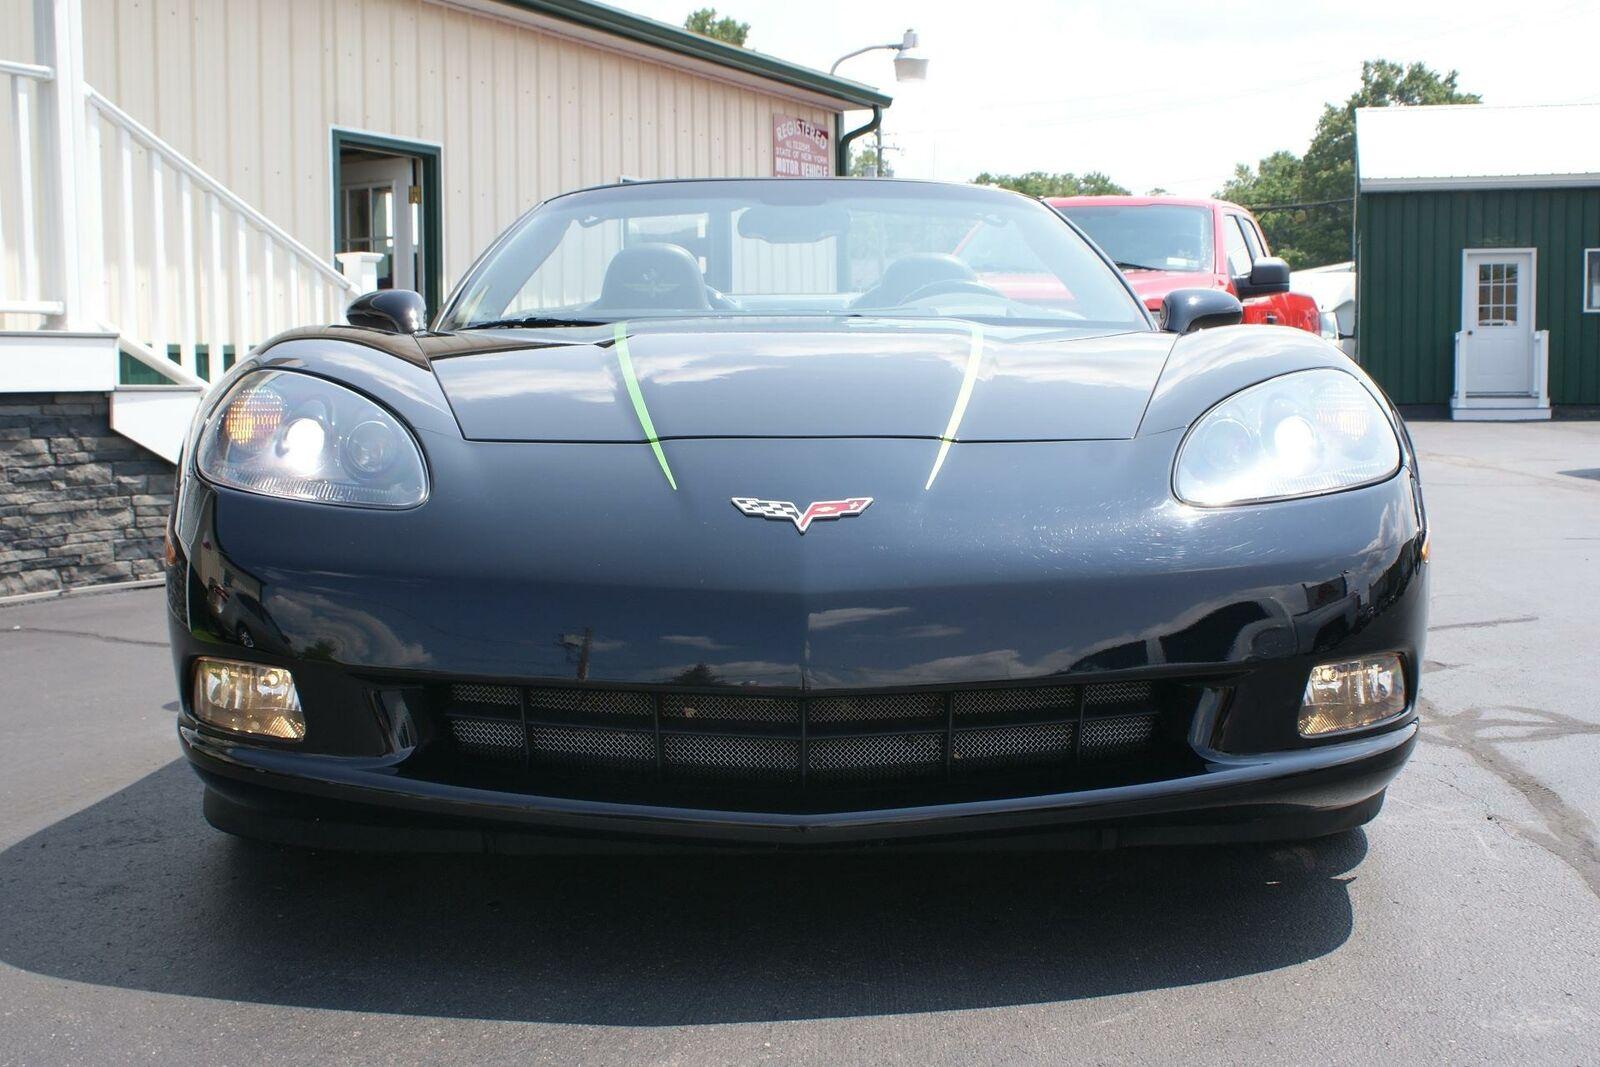 2008 Black Chevrolet Corvette   | C6 Corvette Photo 5